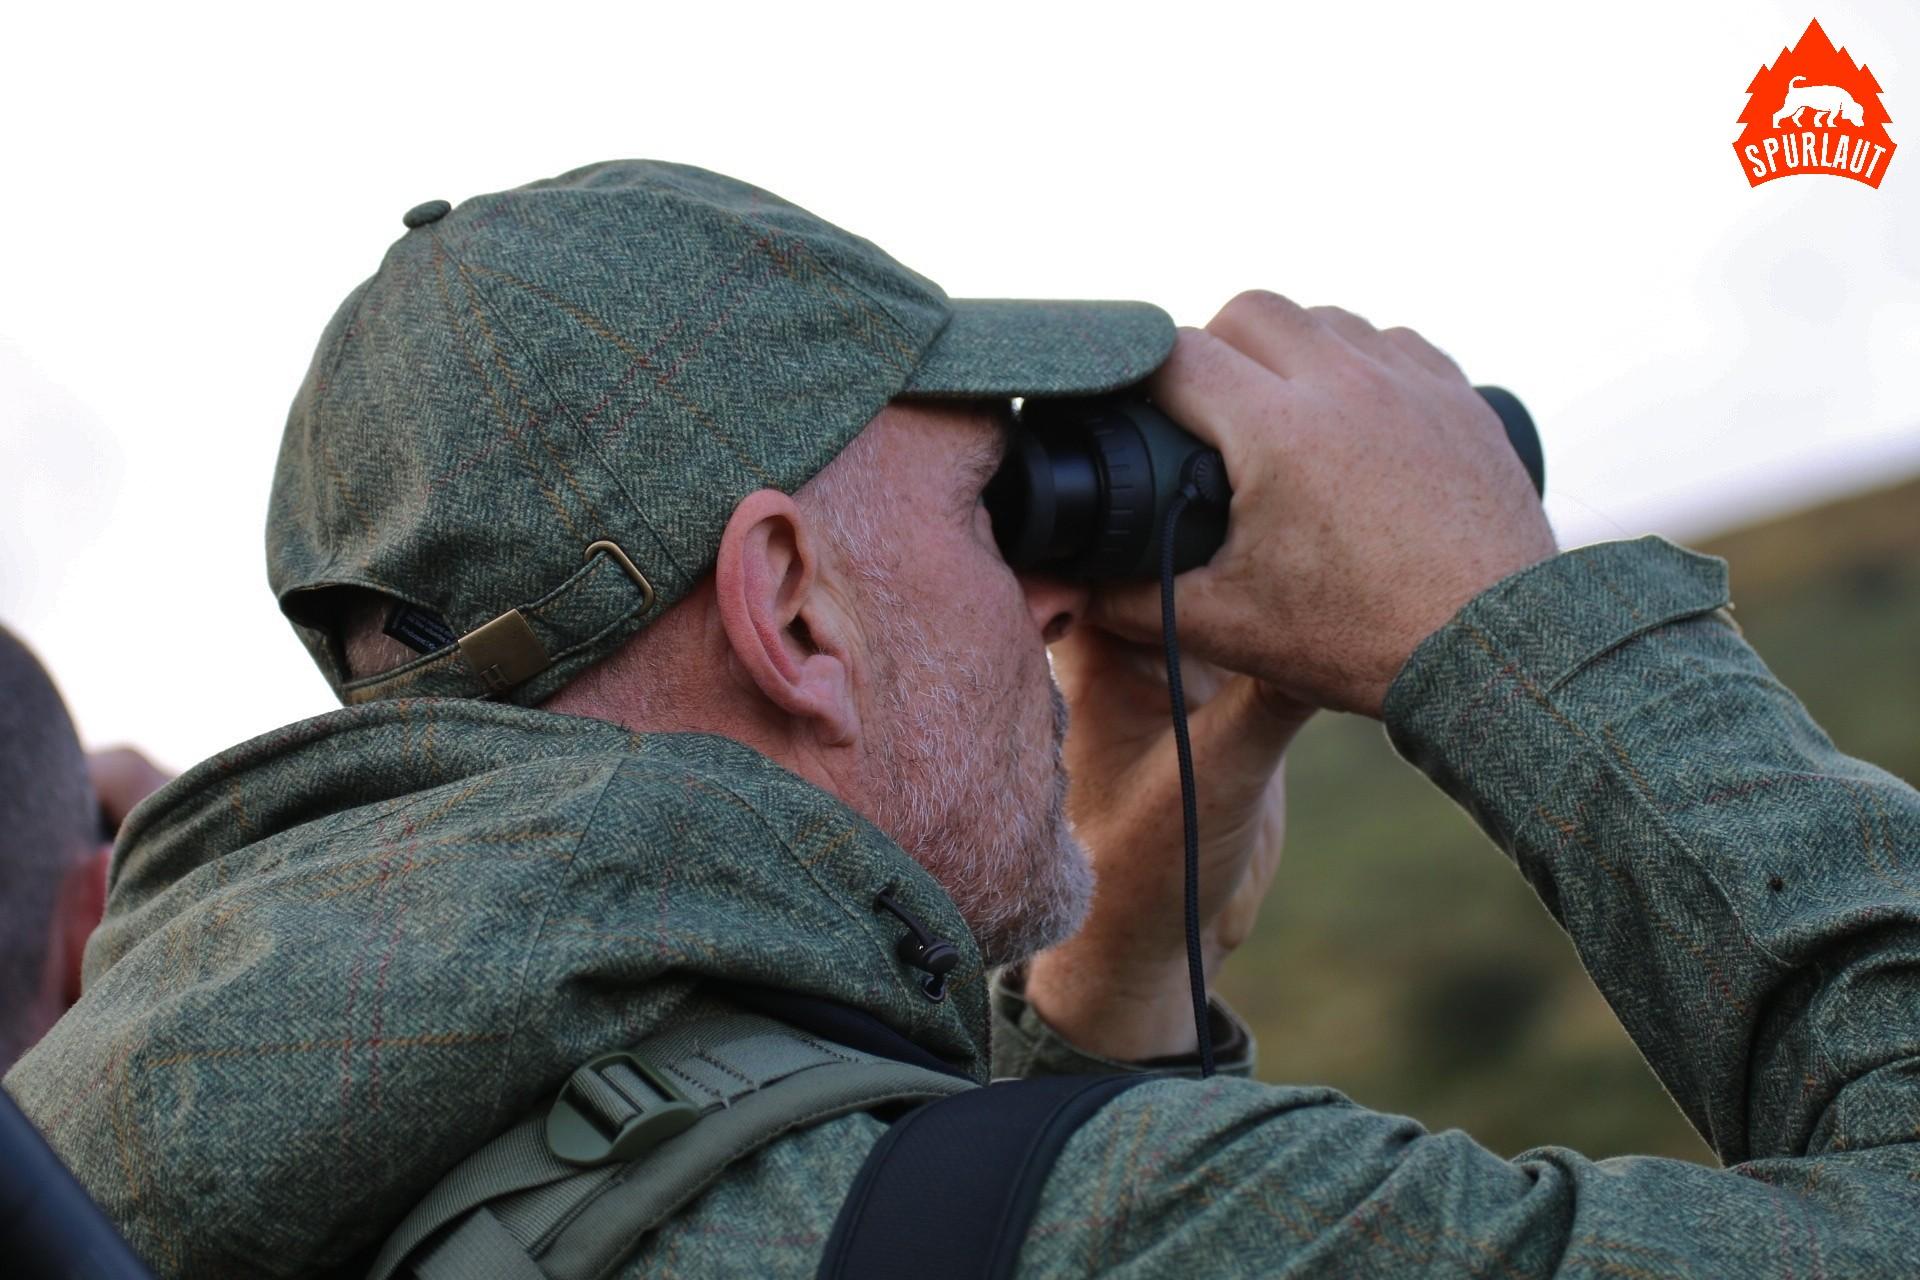 Entfernungsmesser Jagd Test 2014 : Spurlaut jagd news jagdkatalog fachhandel jagdmarkt